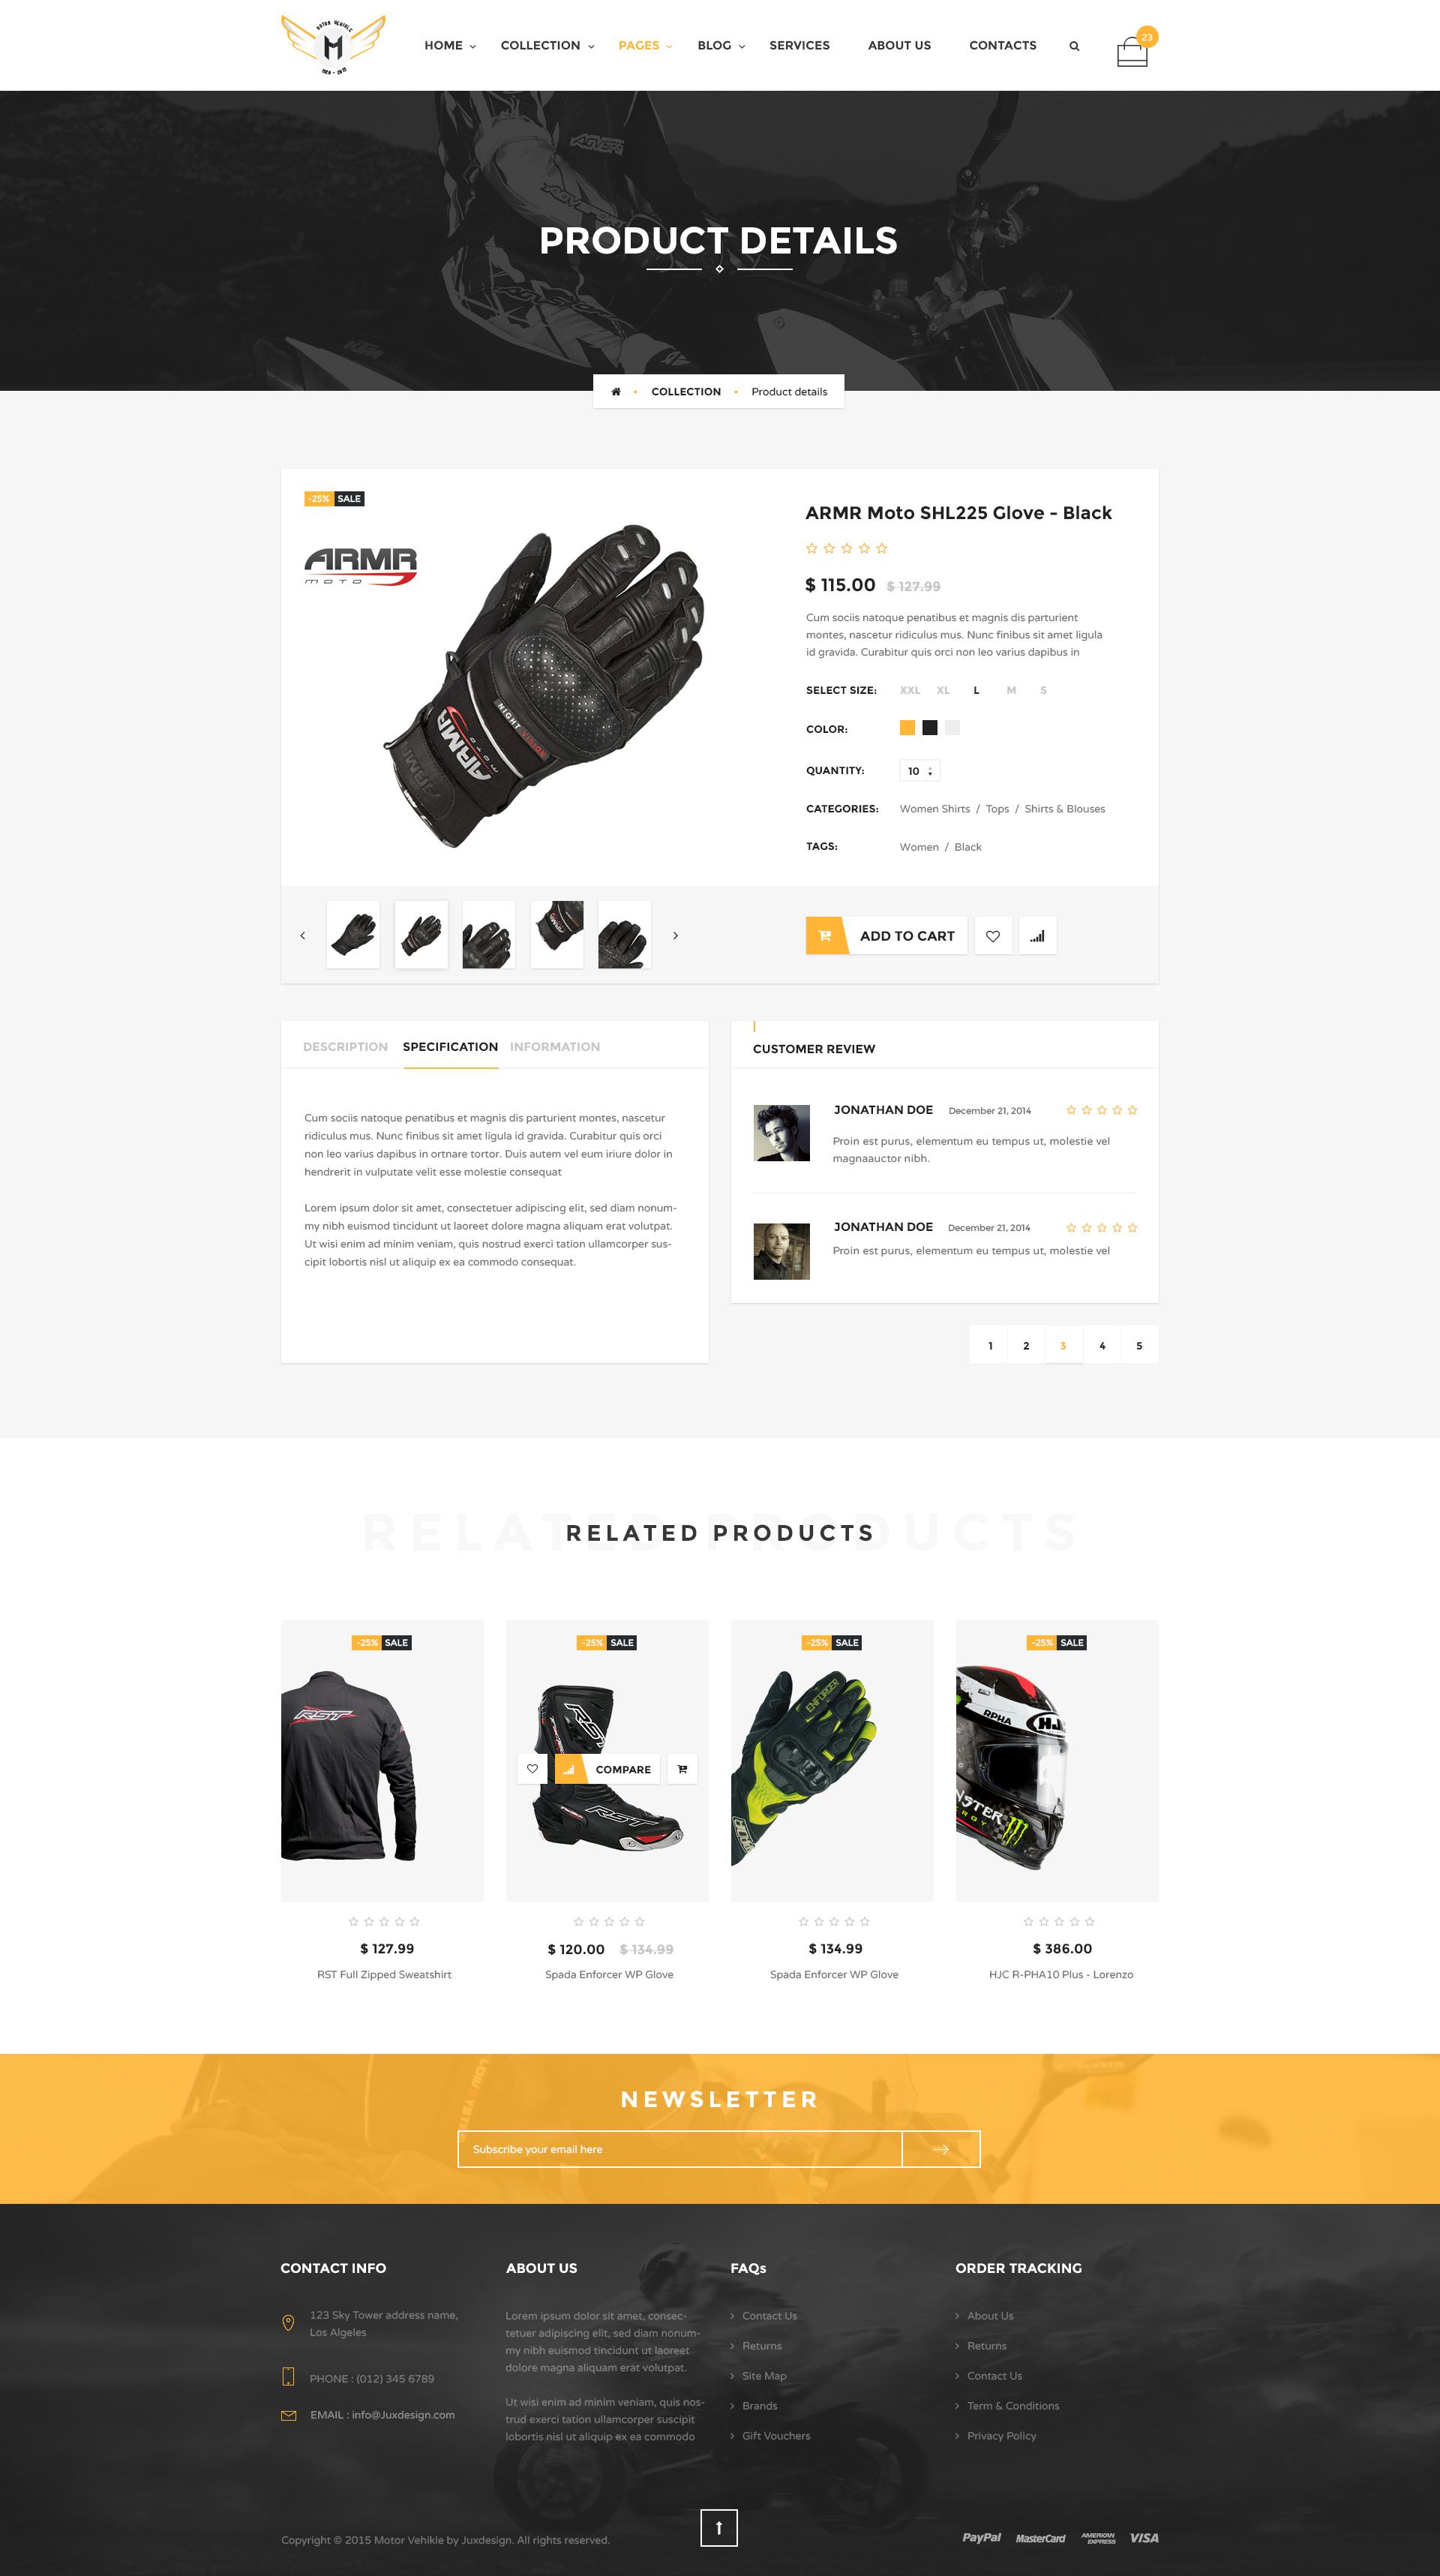 4d195eb9e0fe Motor Vehikal - Motorcycle Online Store WordPress Theme by YoloTheme